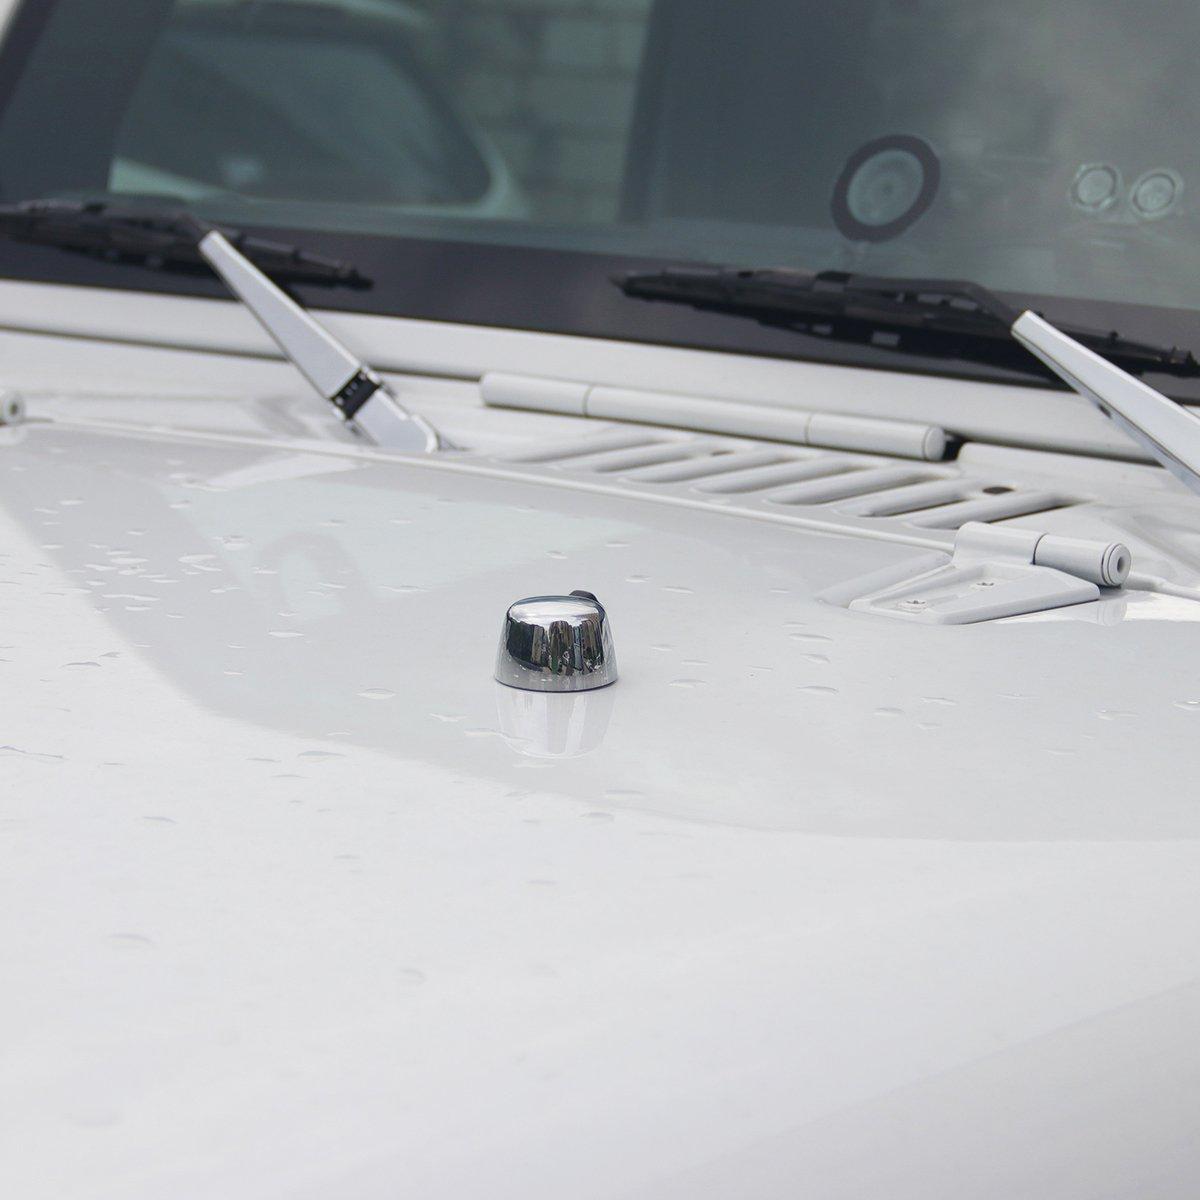 MOEBULB 2-pack Windshield Stops Front Hood Loop Protective Cap Cover for 2007-2017 Jeep Wrangler JK(Stops Loop Cap Red)